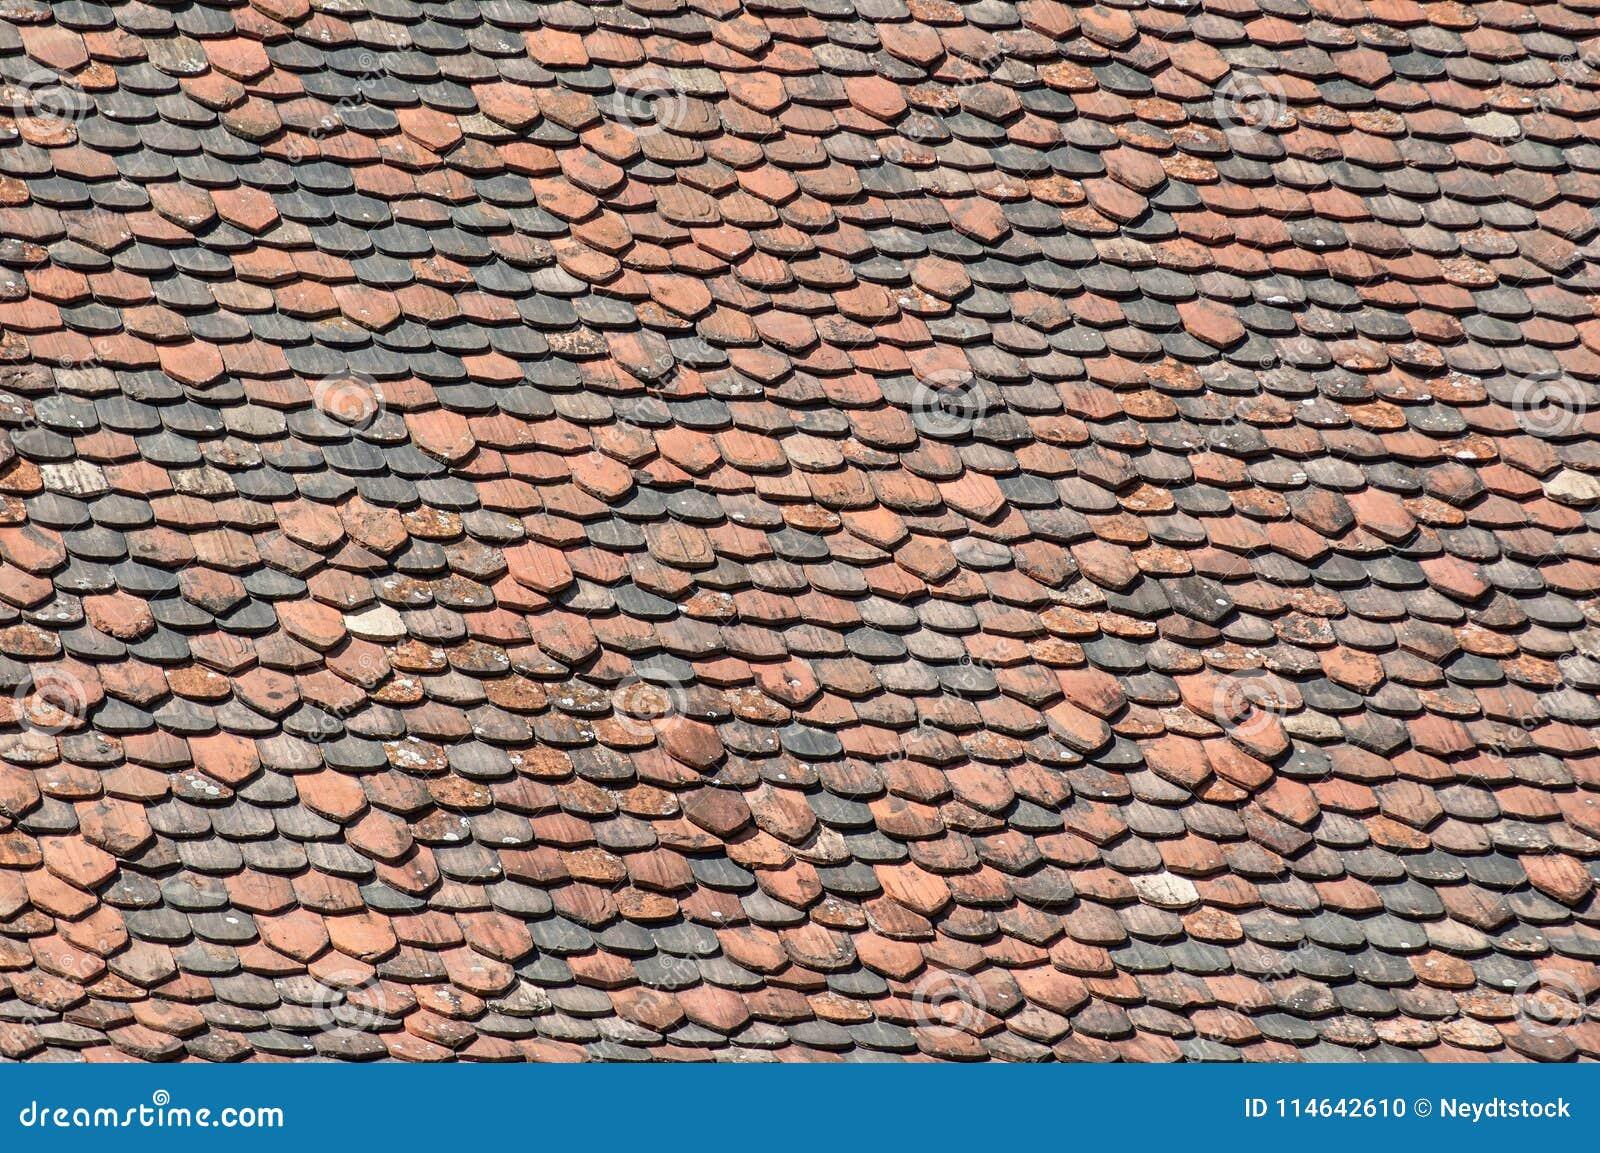 Terra Cotta Roof Tiles Texture Stock Photo - Image of pattern, stone